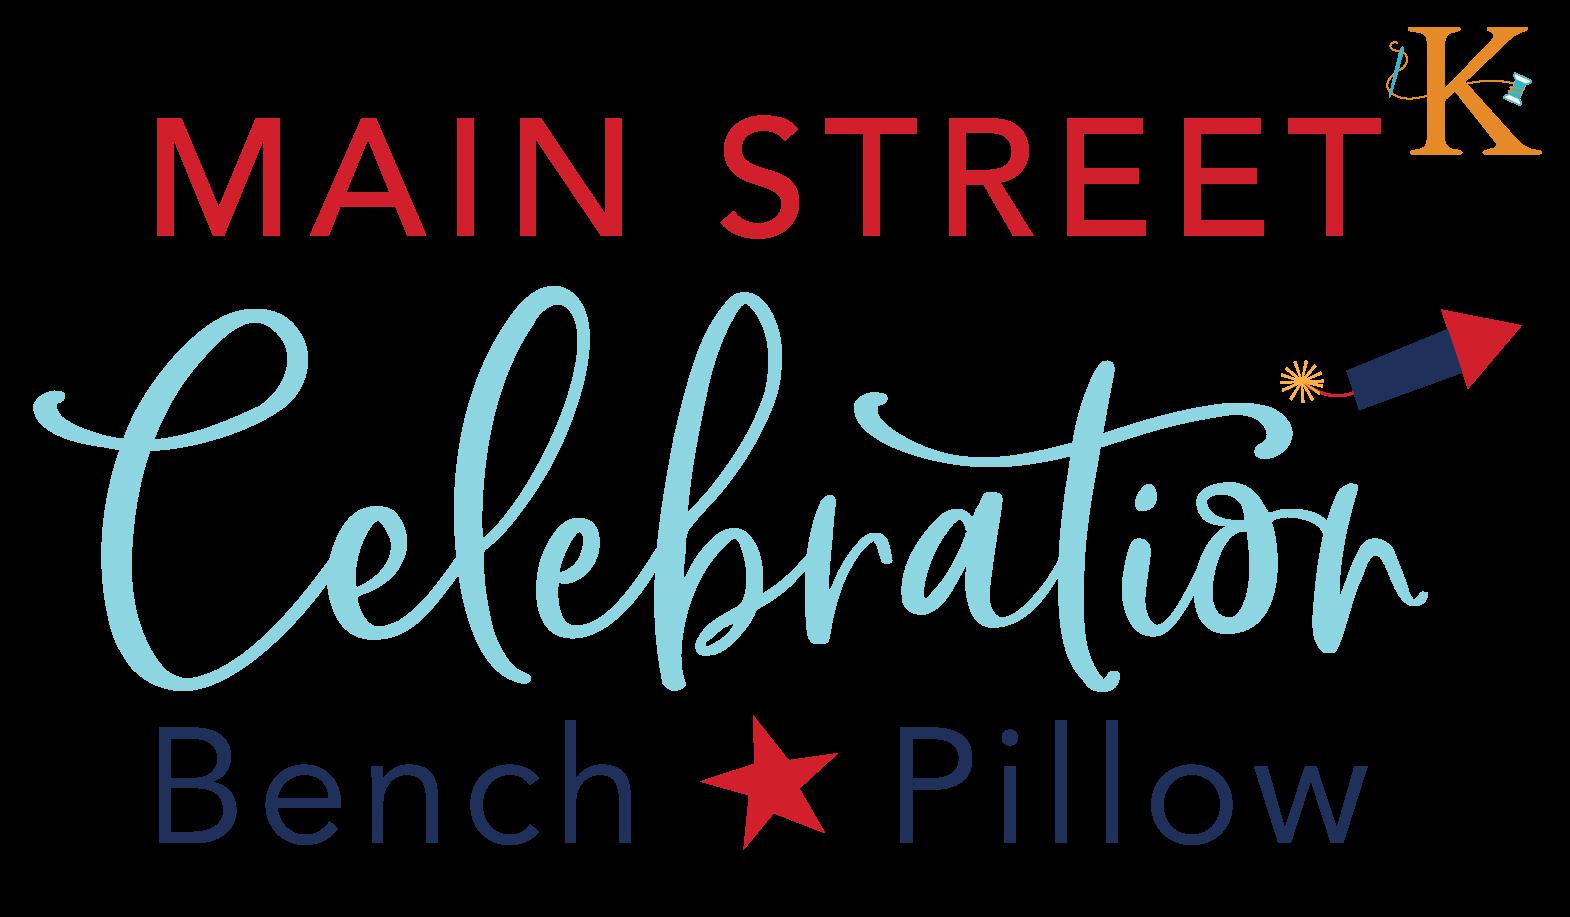 Main Street Celebration Fabric Kit